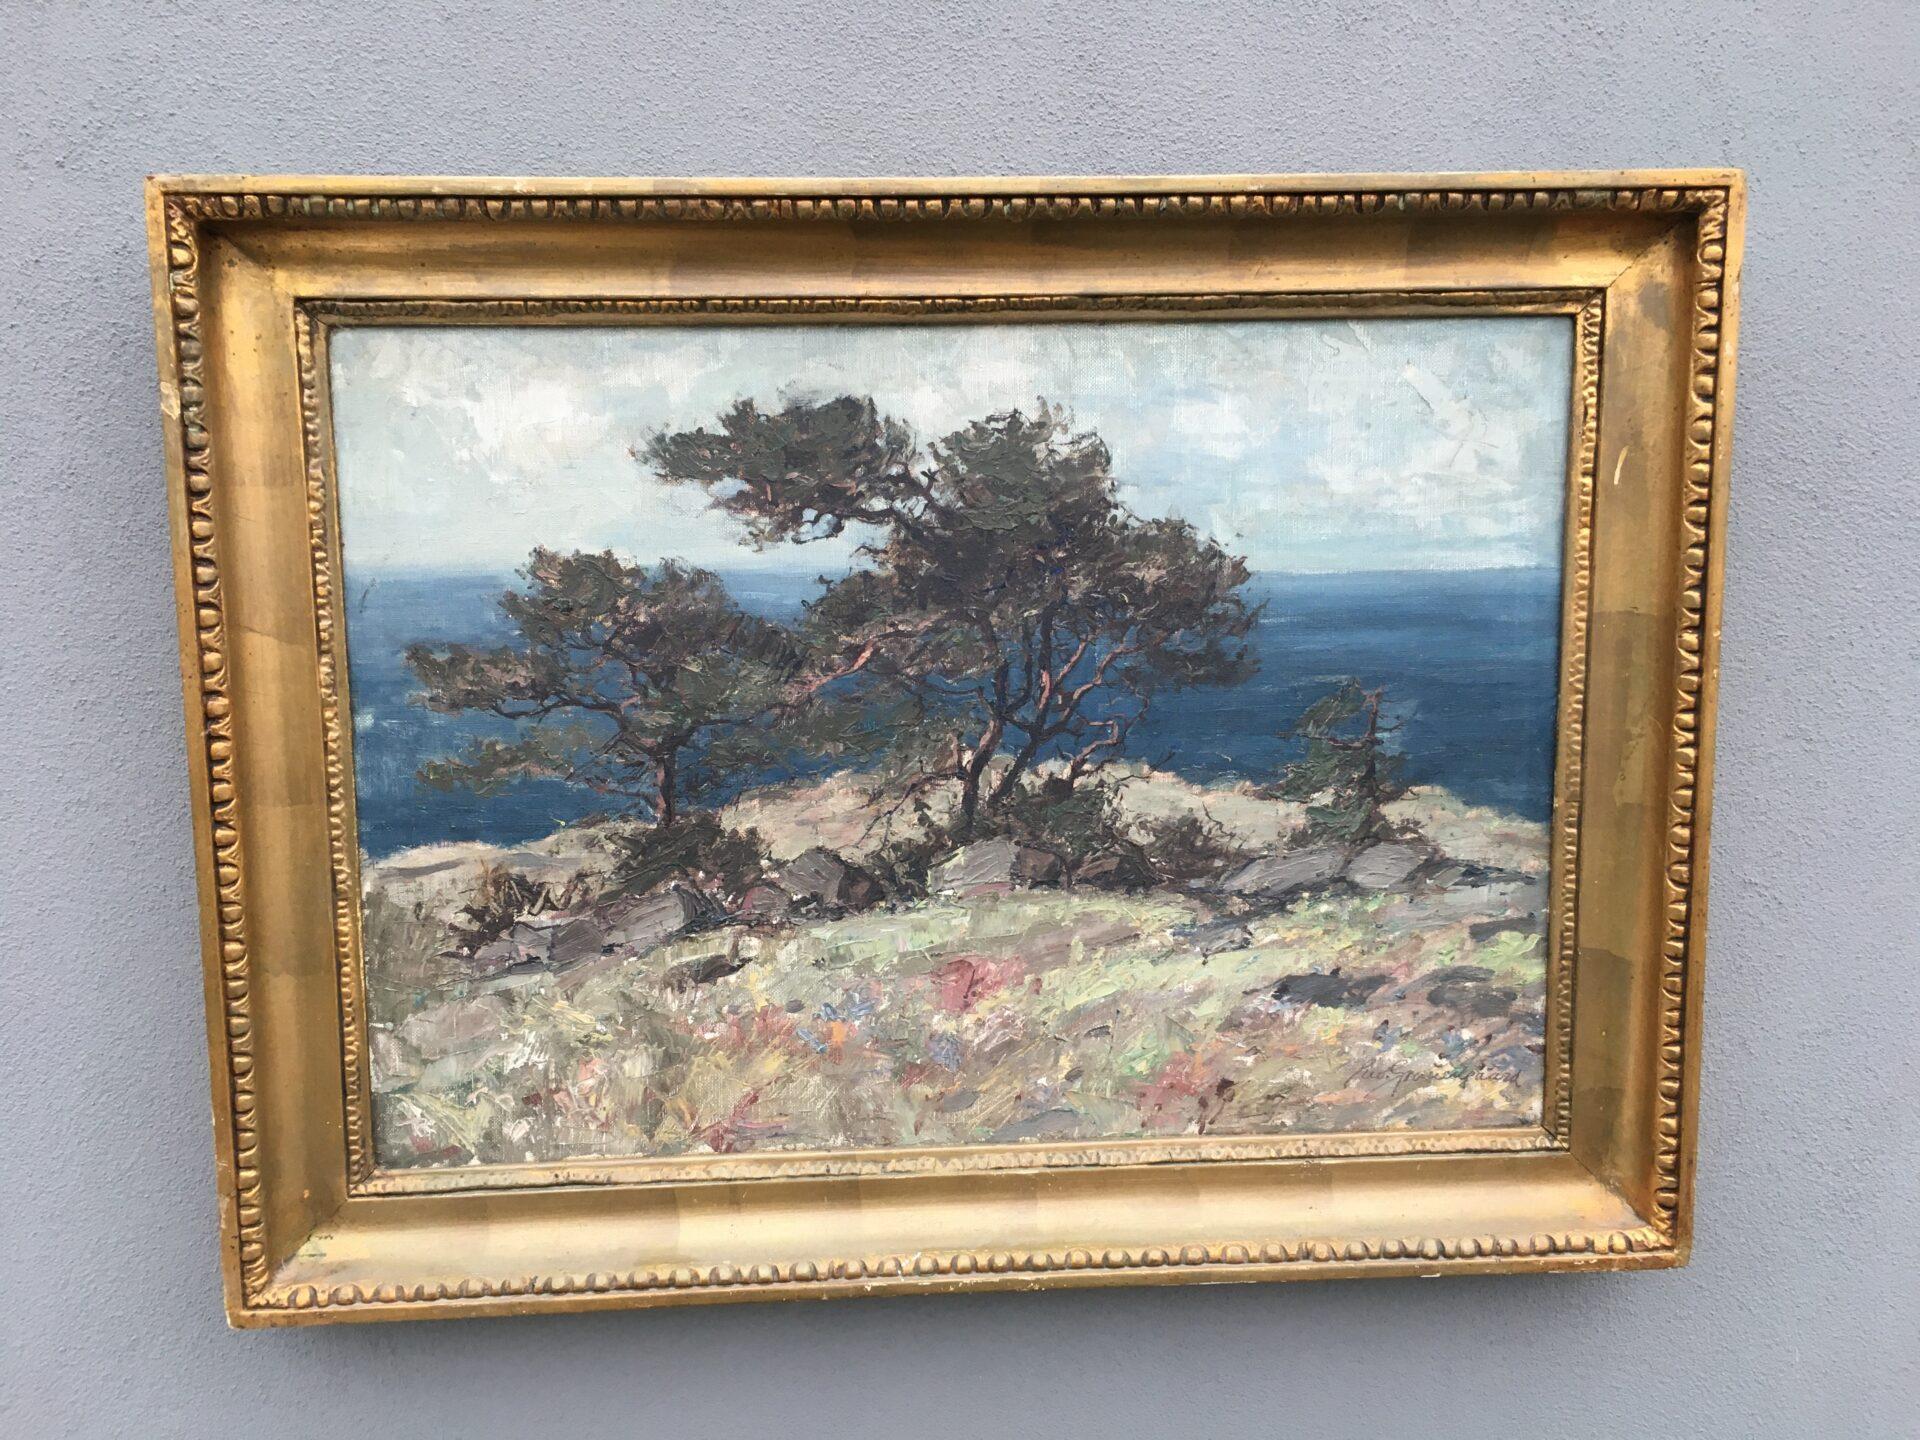 Flot maleri monteret i original Damborg ramme, (56x77 cm) sign. Ewald Grauengaard (??) pris 1000kr